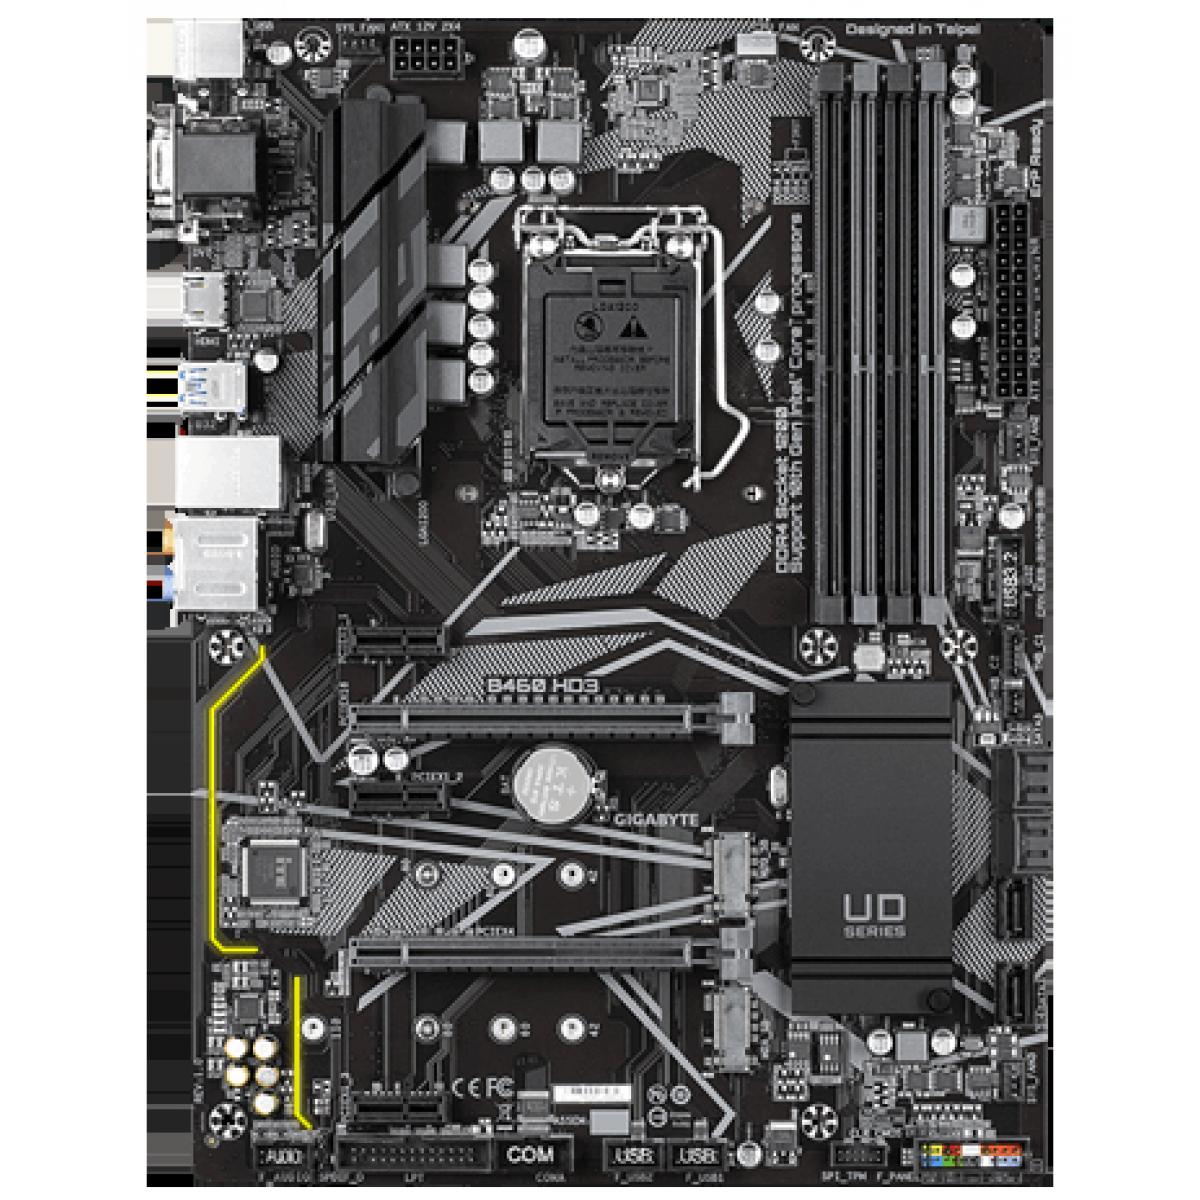 Placa Mãe Gigabyte B460M D3H , Chipset B460, Intel LGA 1200, mATX, DDR4